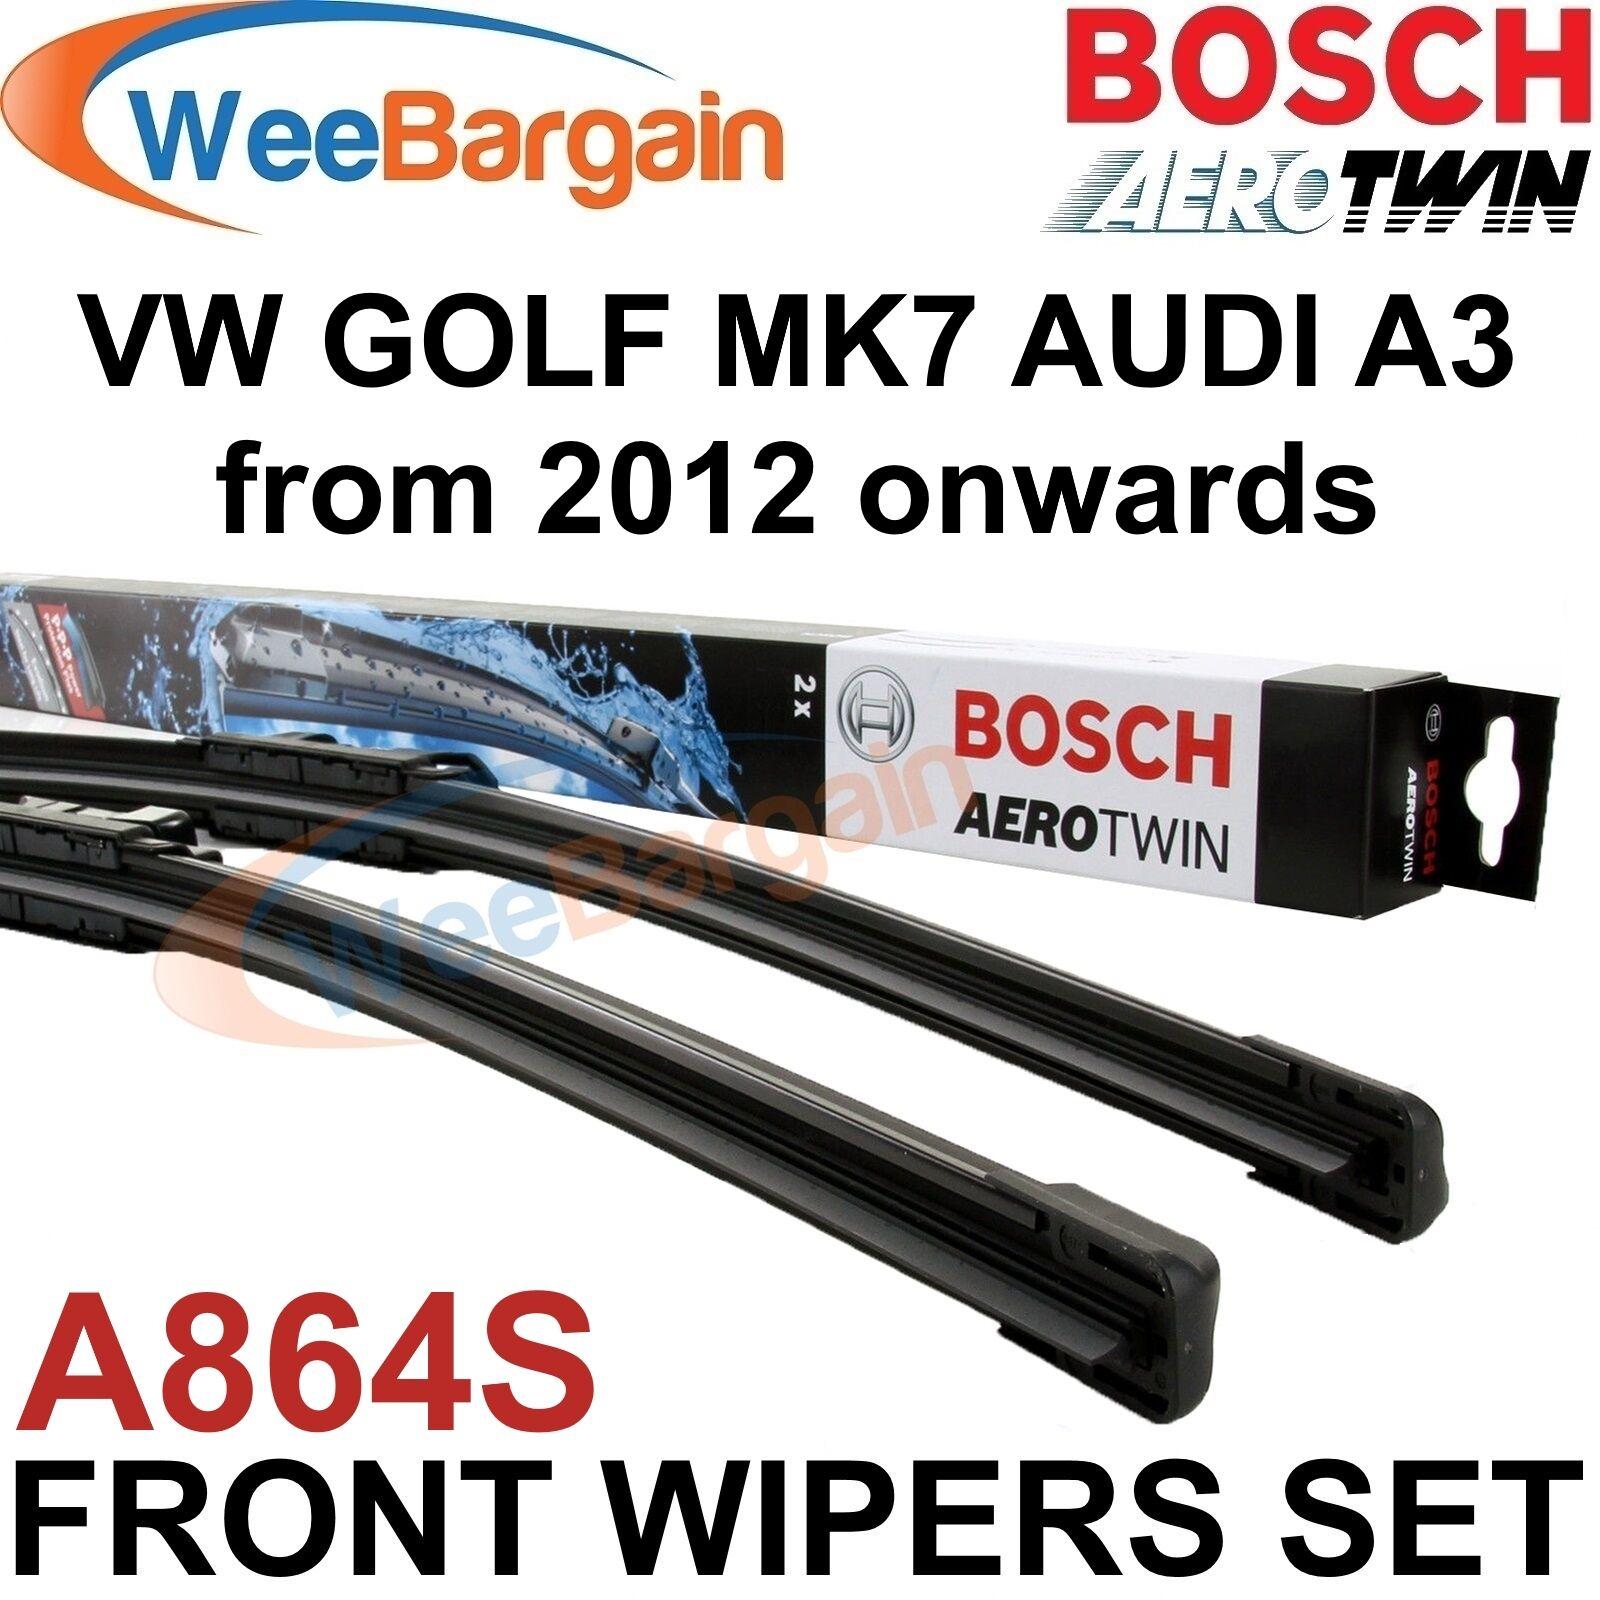 DAILY Van May 1999 to Feb 2014 Windscreen Wiper Blade Kit 2 x Blades